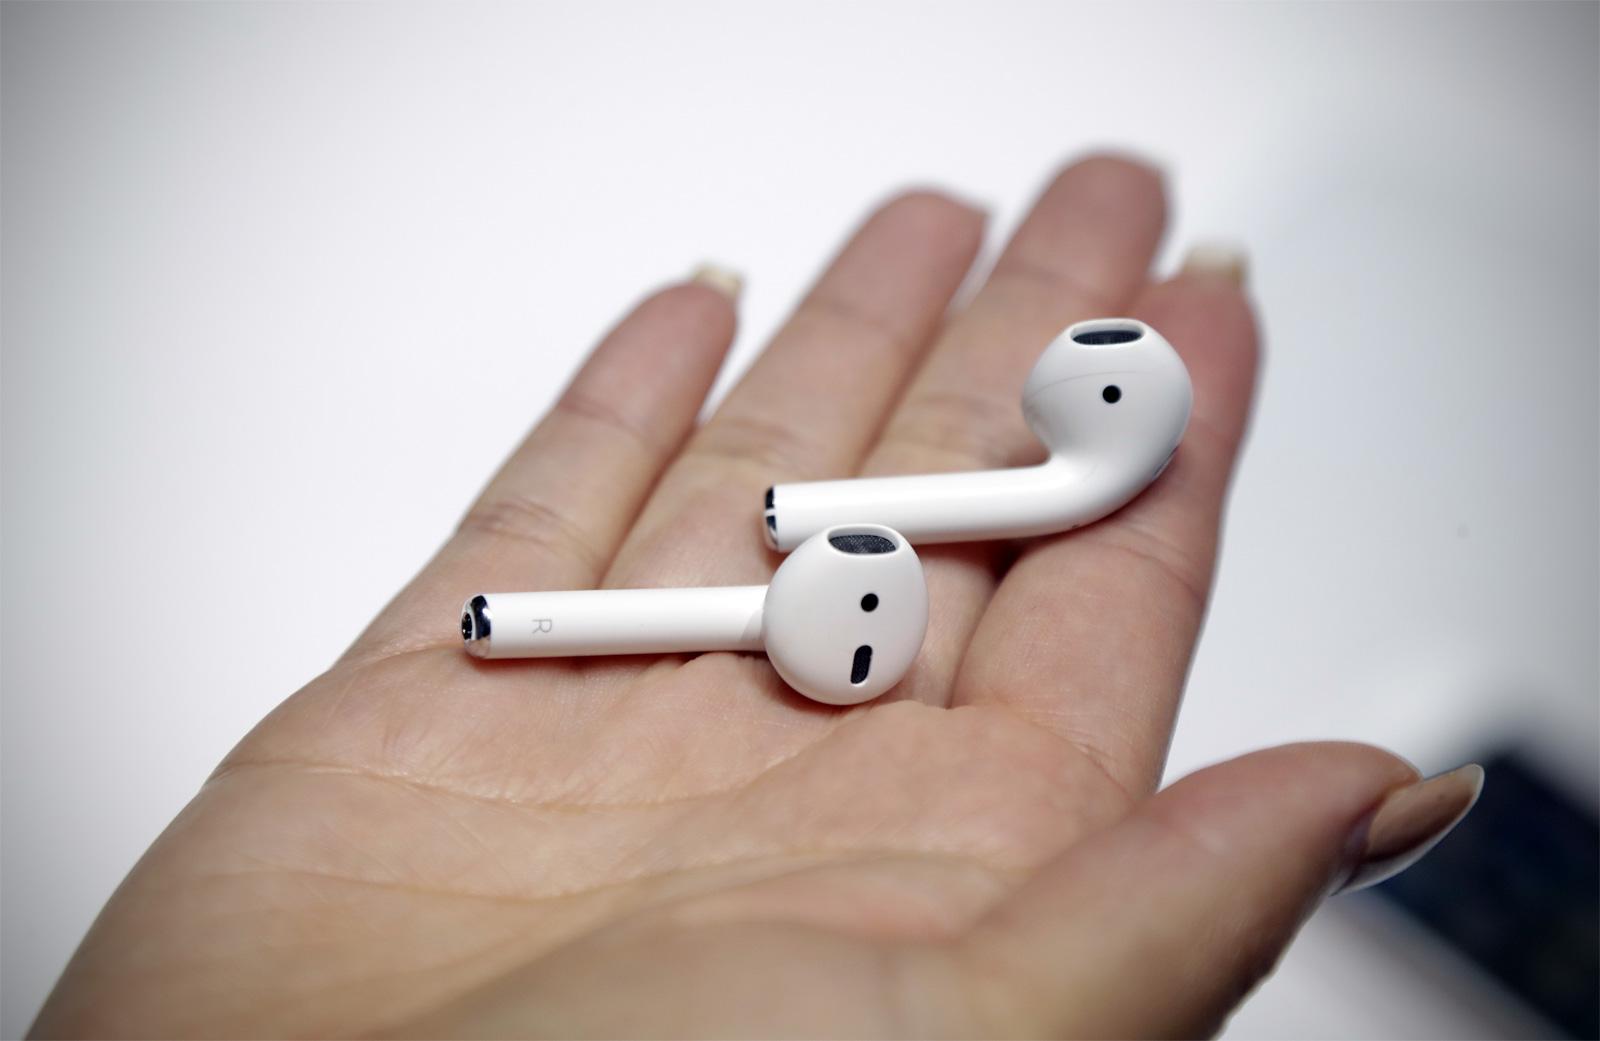 Apple AirPods Alternative